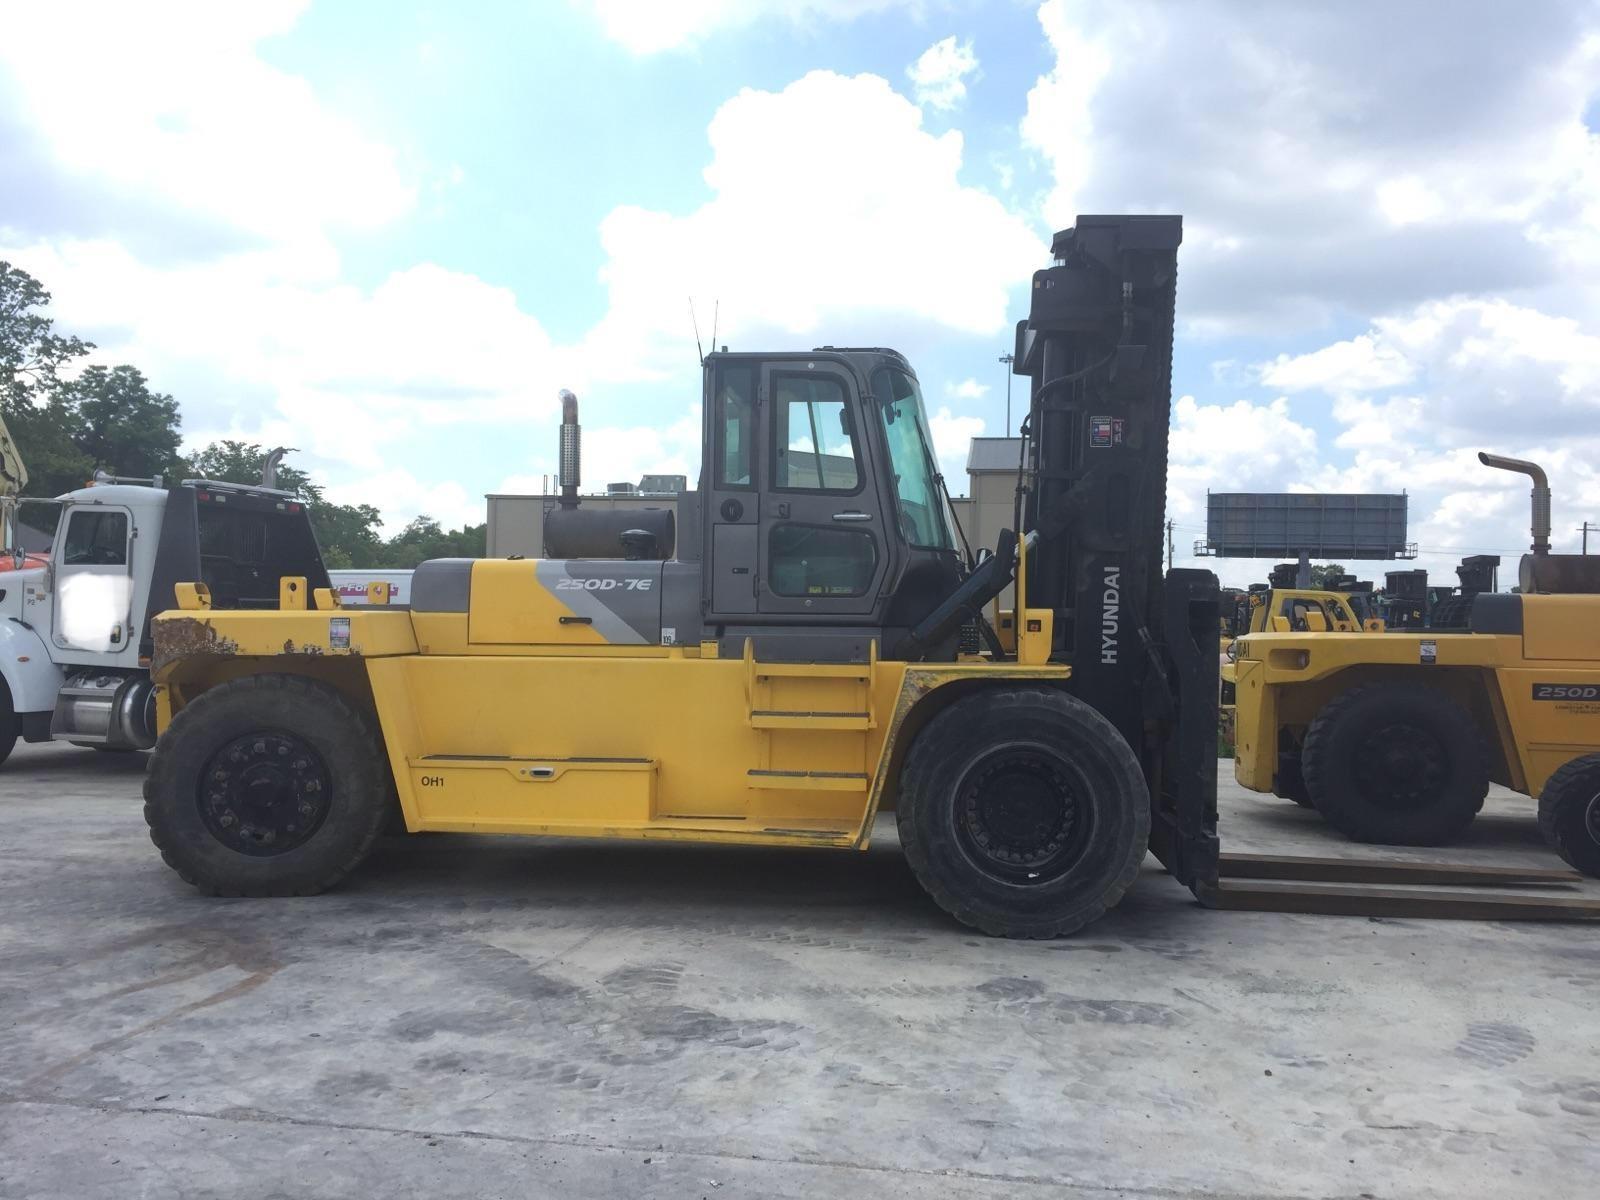 Used, 2014, Hyundai, 250D, Forklifts / Lift Trucks